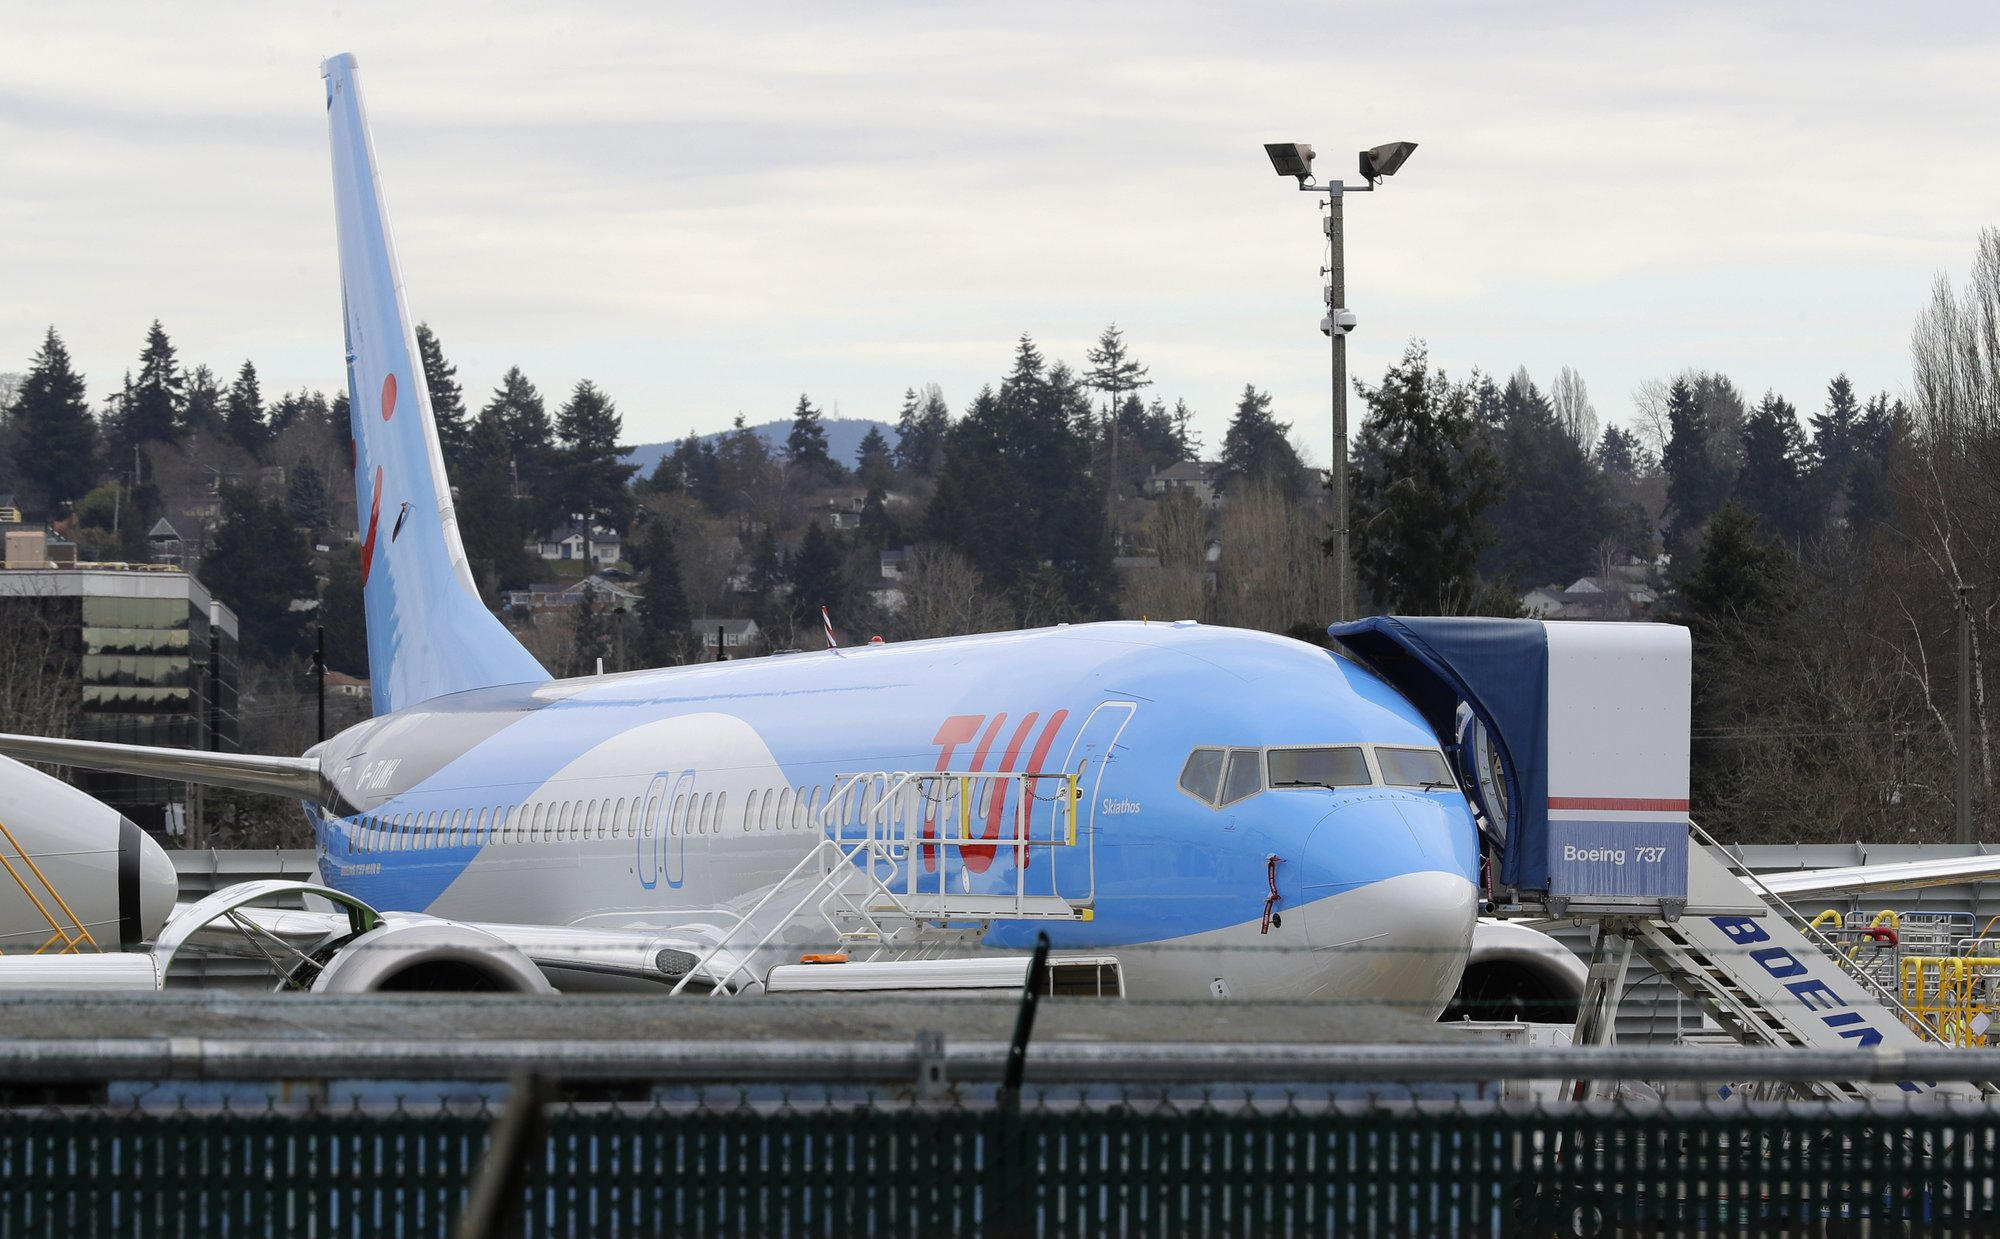 Boeing 737 Max plane makes emergency landing in US city of Orlando